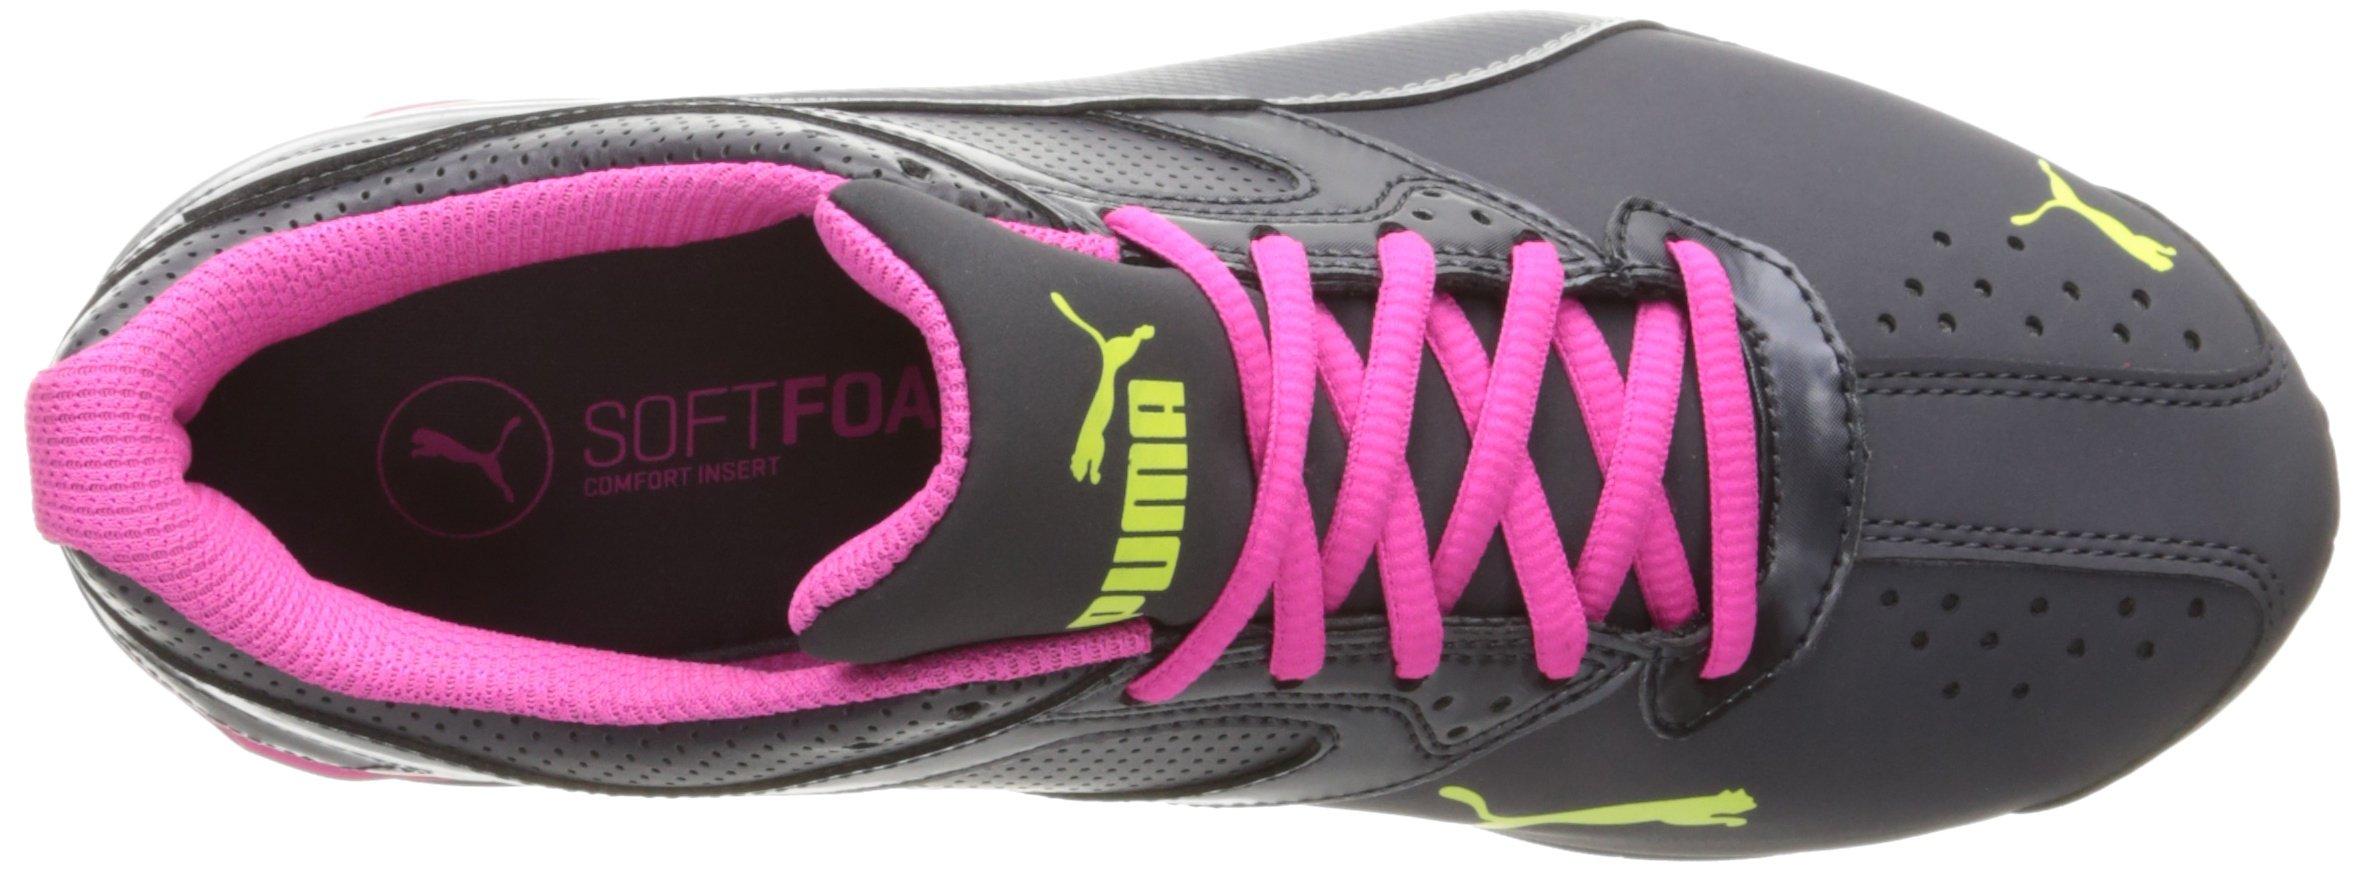 PUMA Women's Tazon 6 WN's fm Sneaker Periscope Silver-Pink glo, 6 M US by PUMA (Image #8)